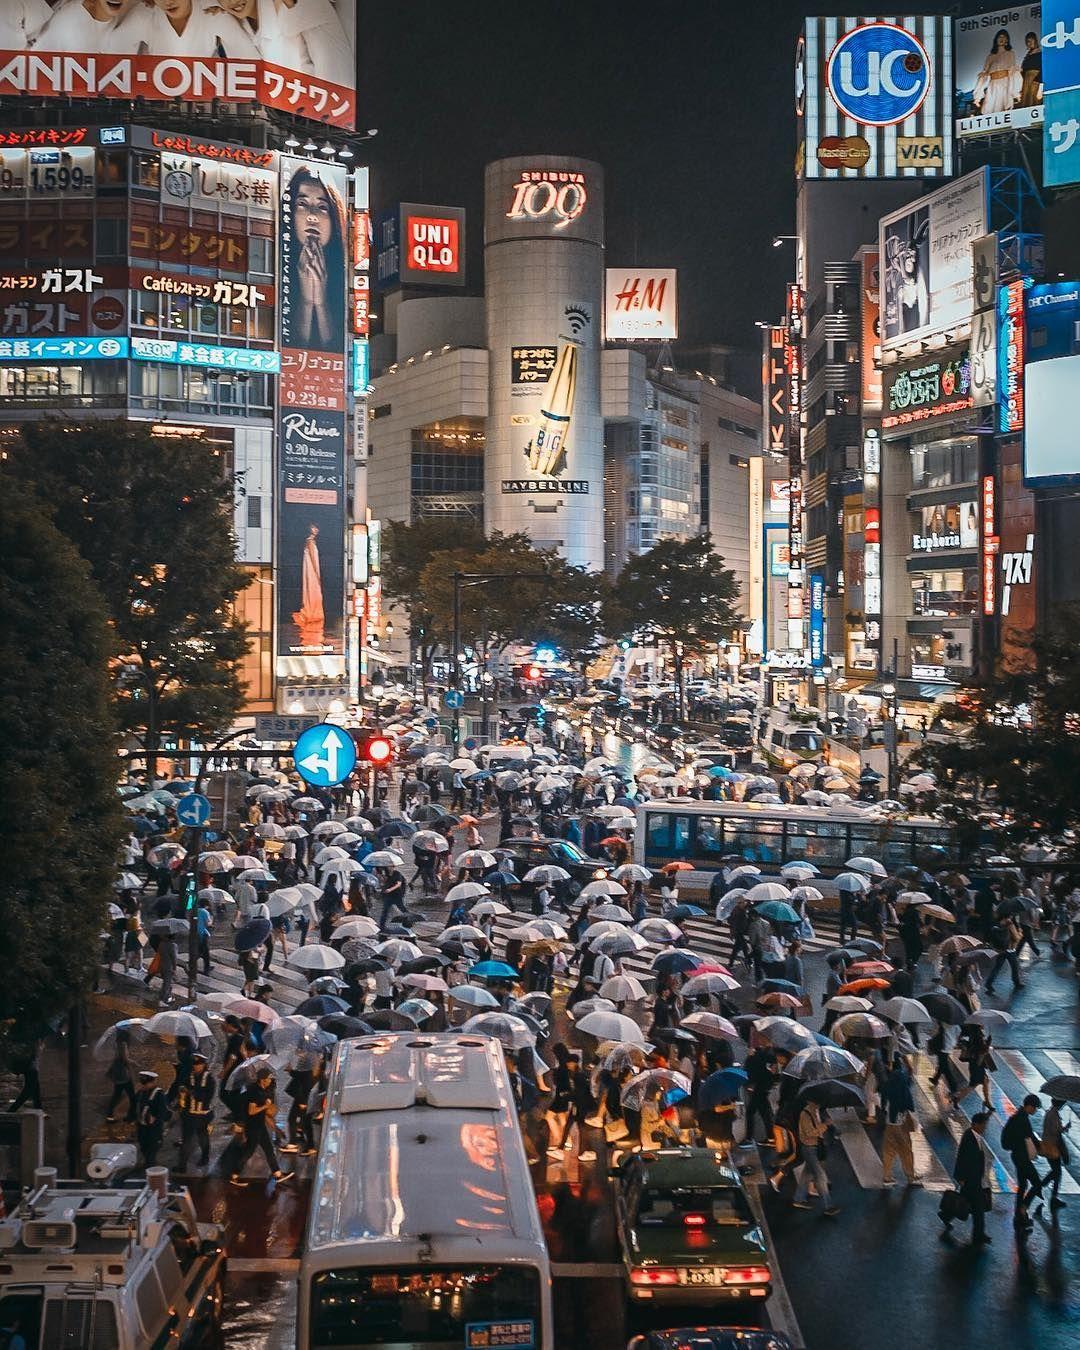 Shibuya crossing Tokyo Likes Comments Tat deepsky